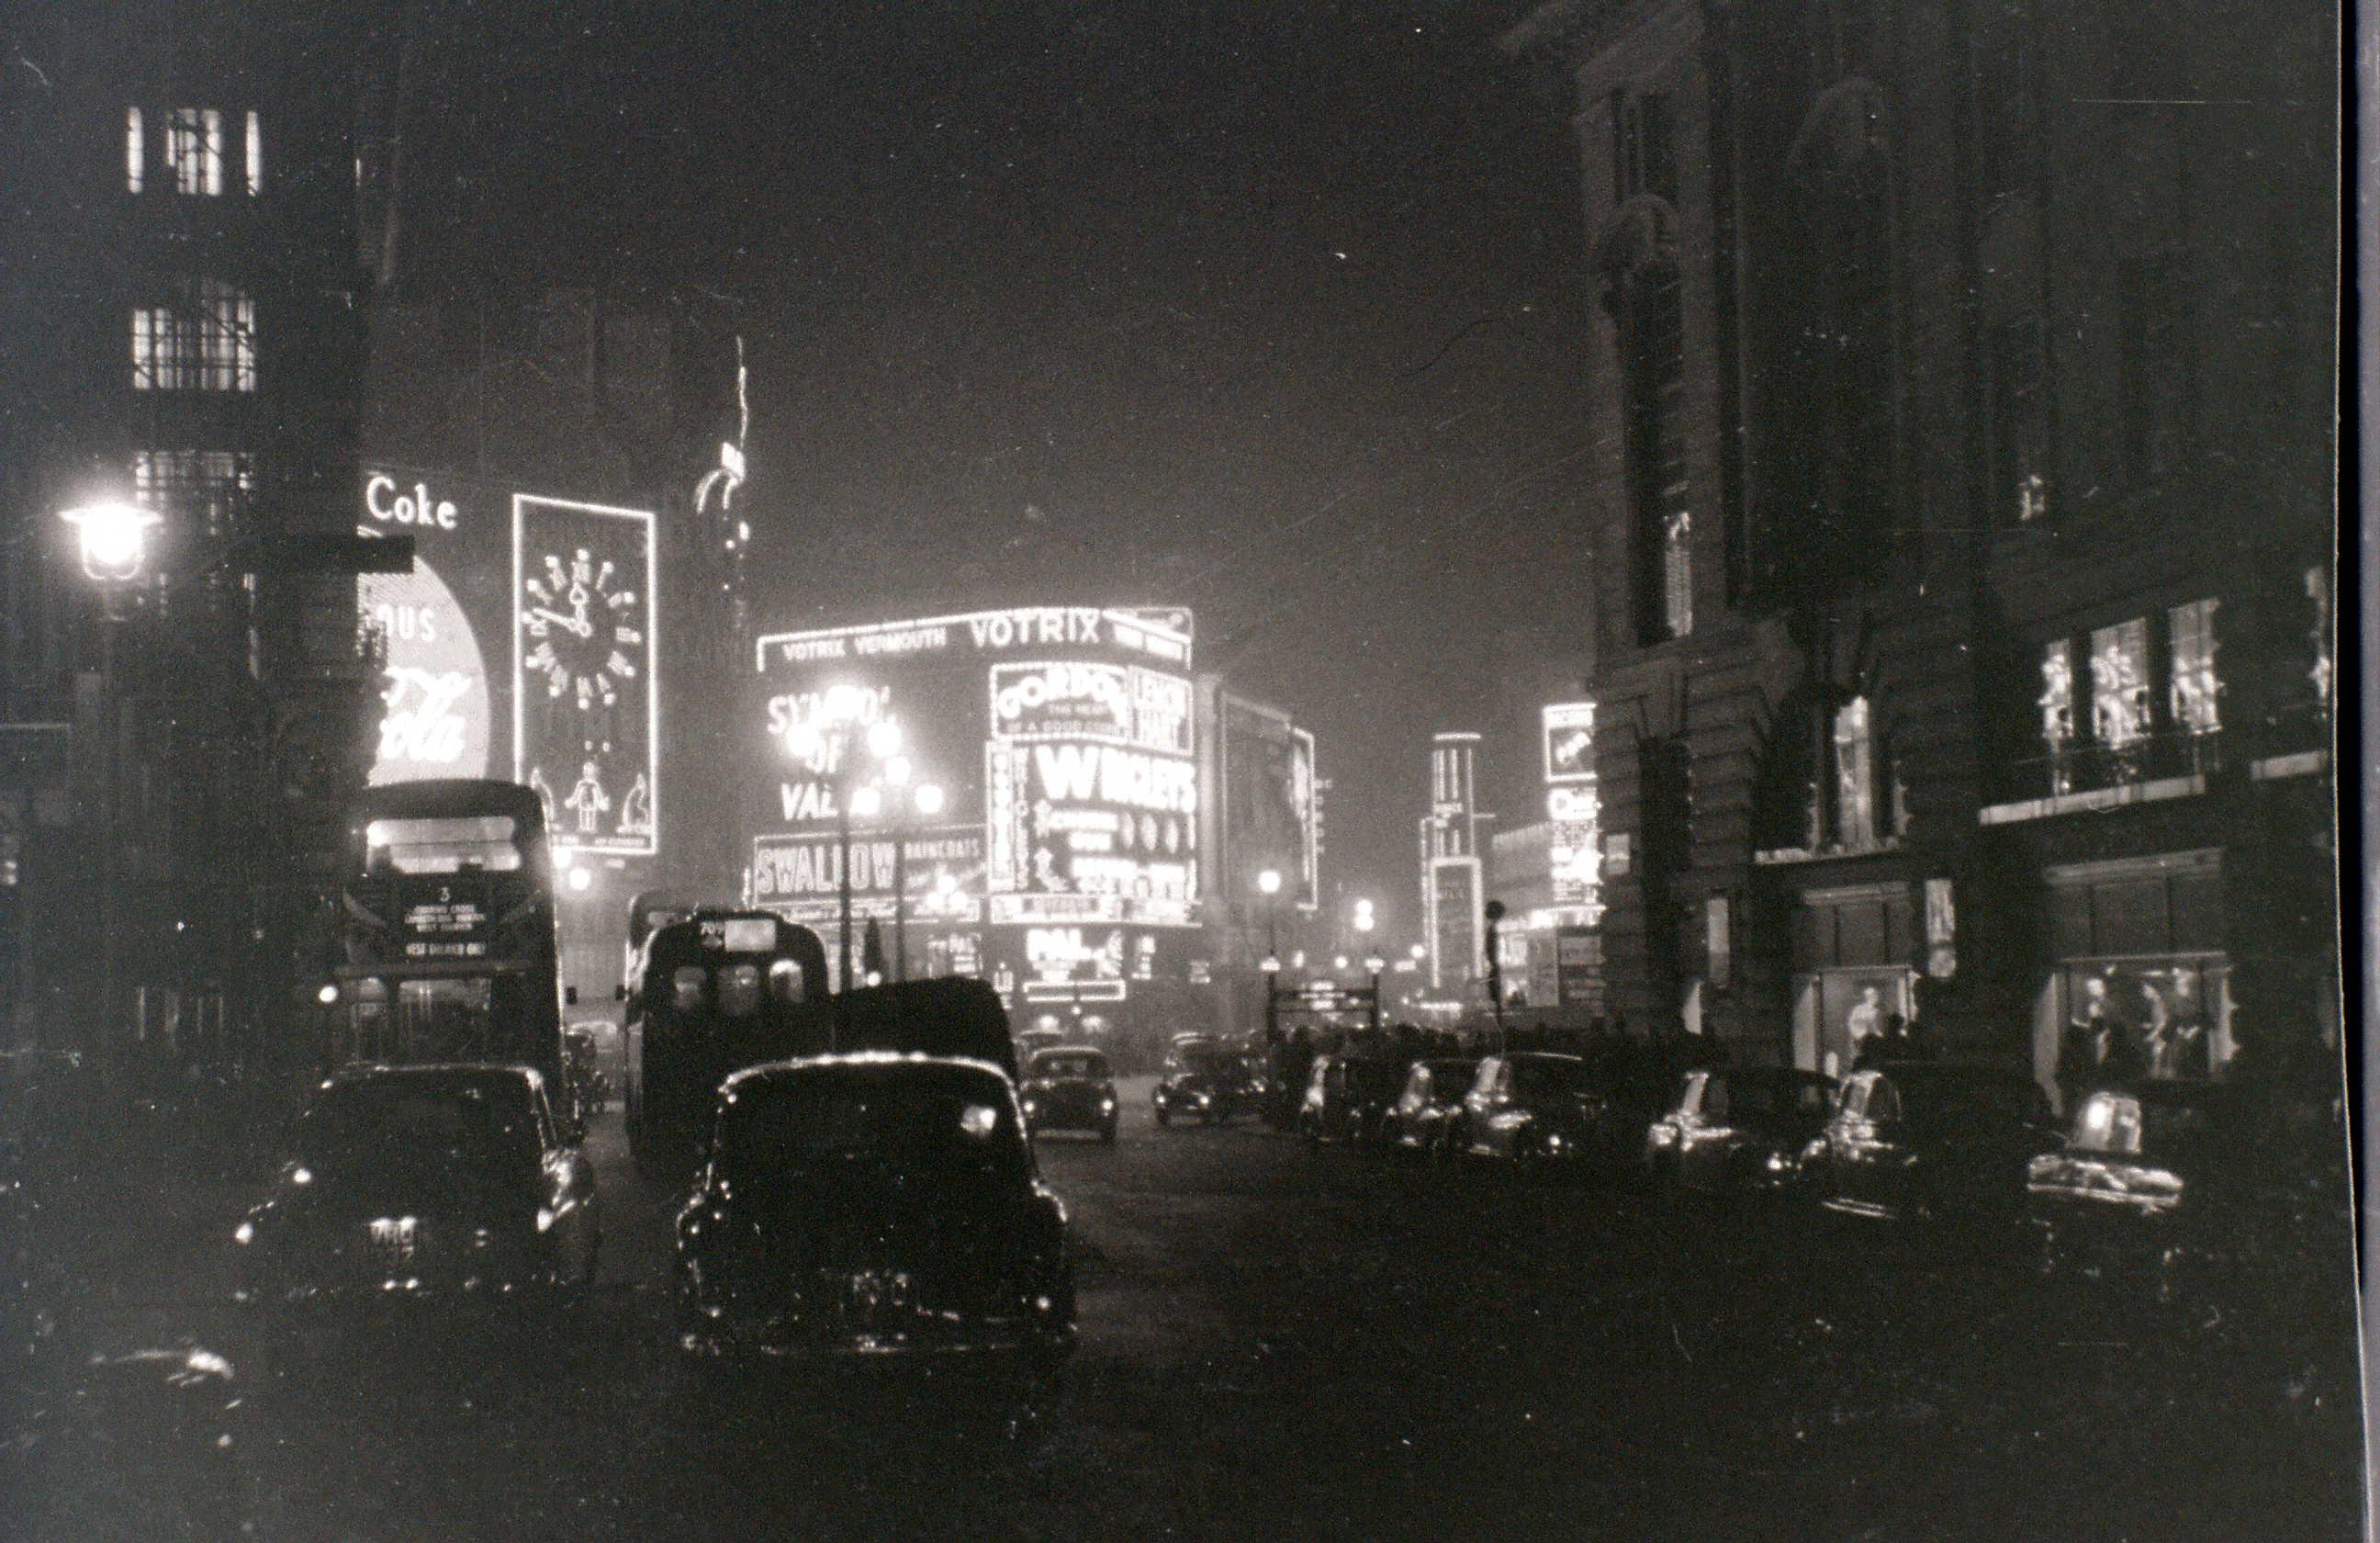 Piccadilly-Circus-London-5-November-1955-1